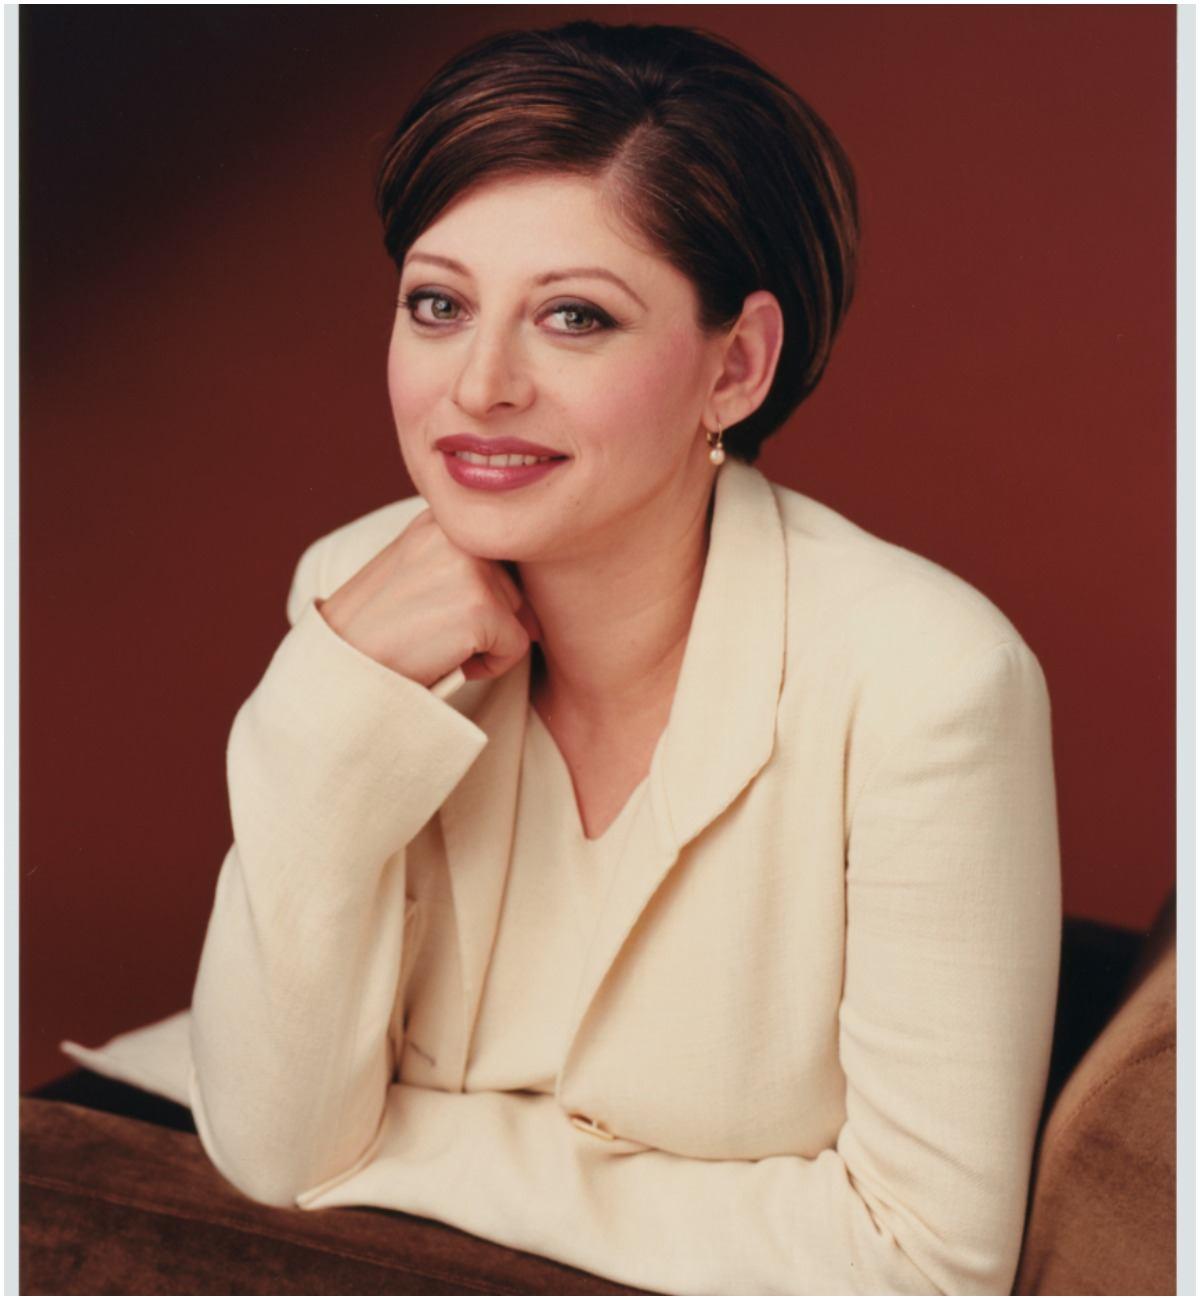 Maria Bartiromo salary